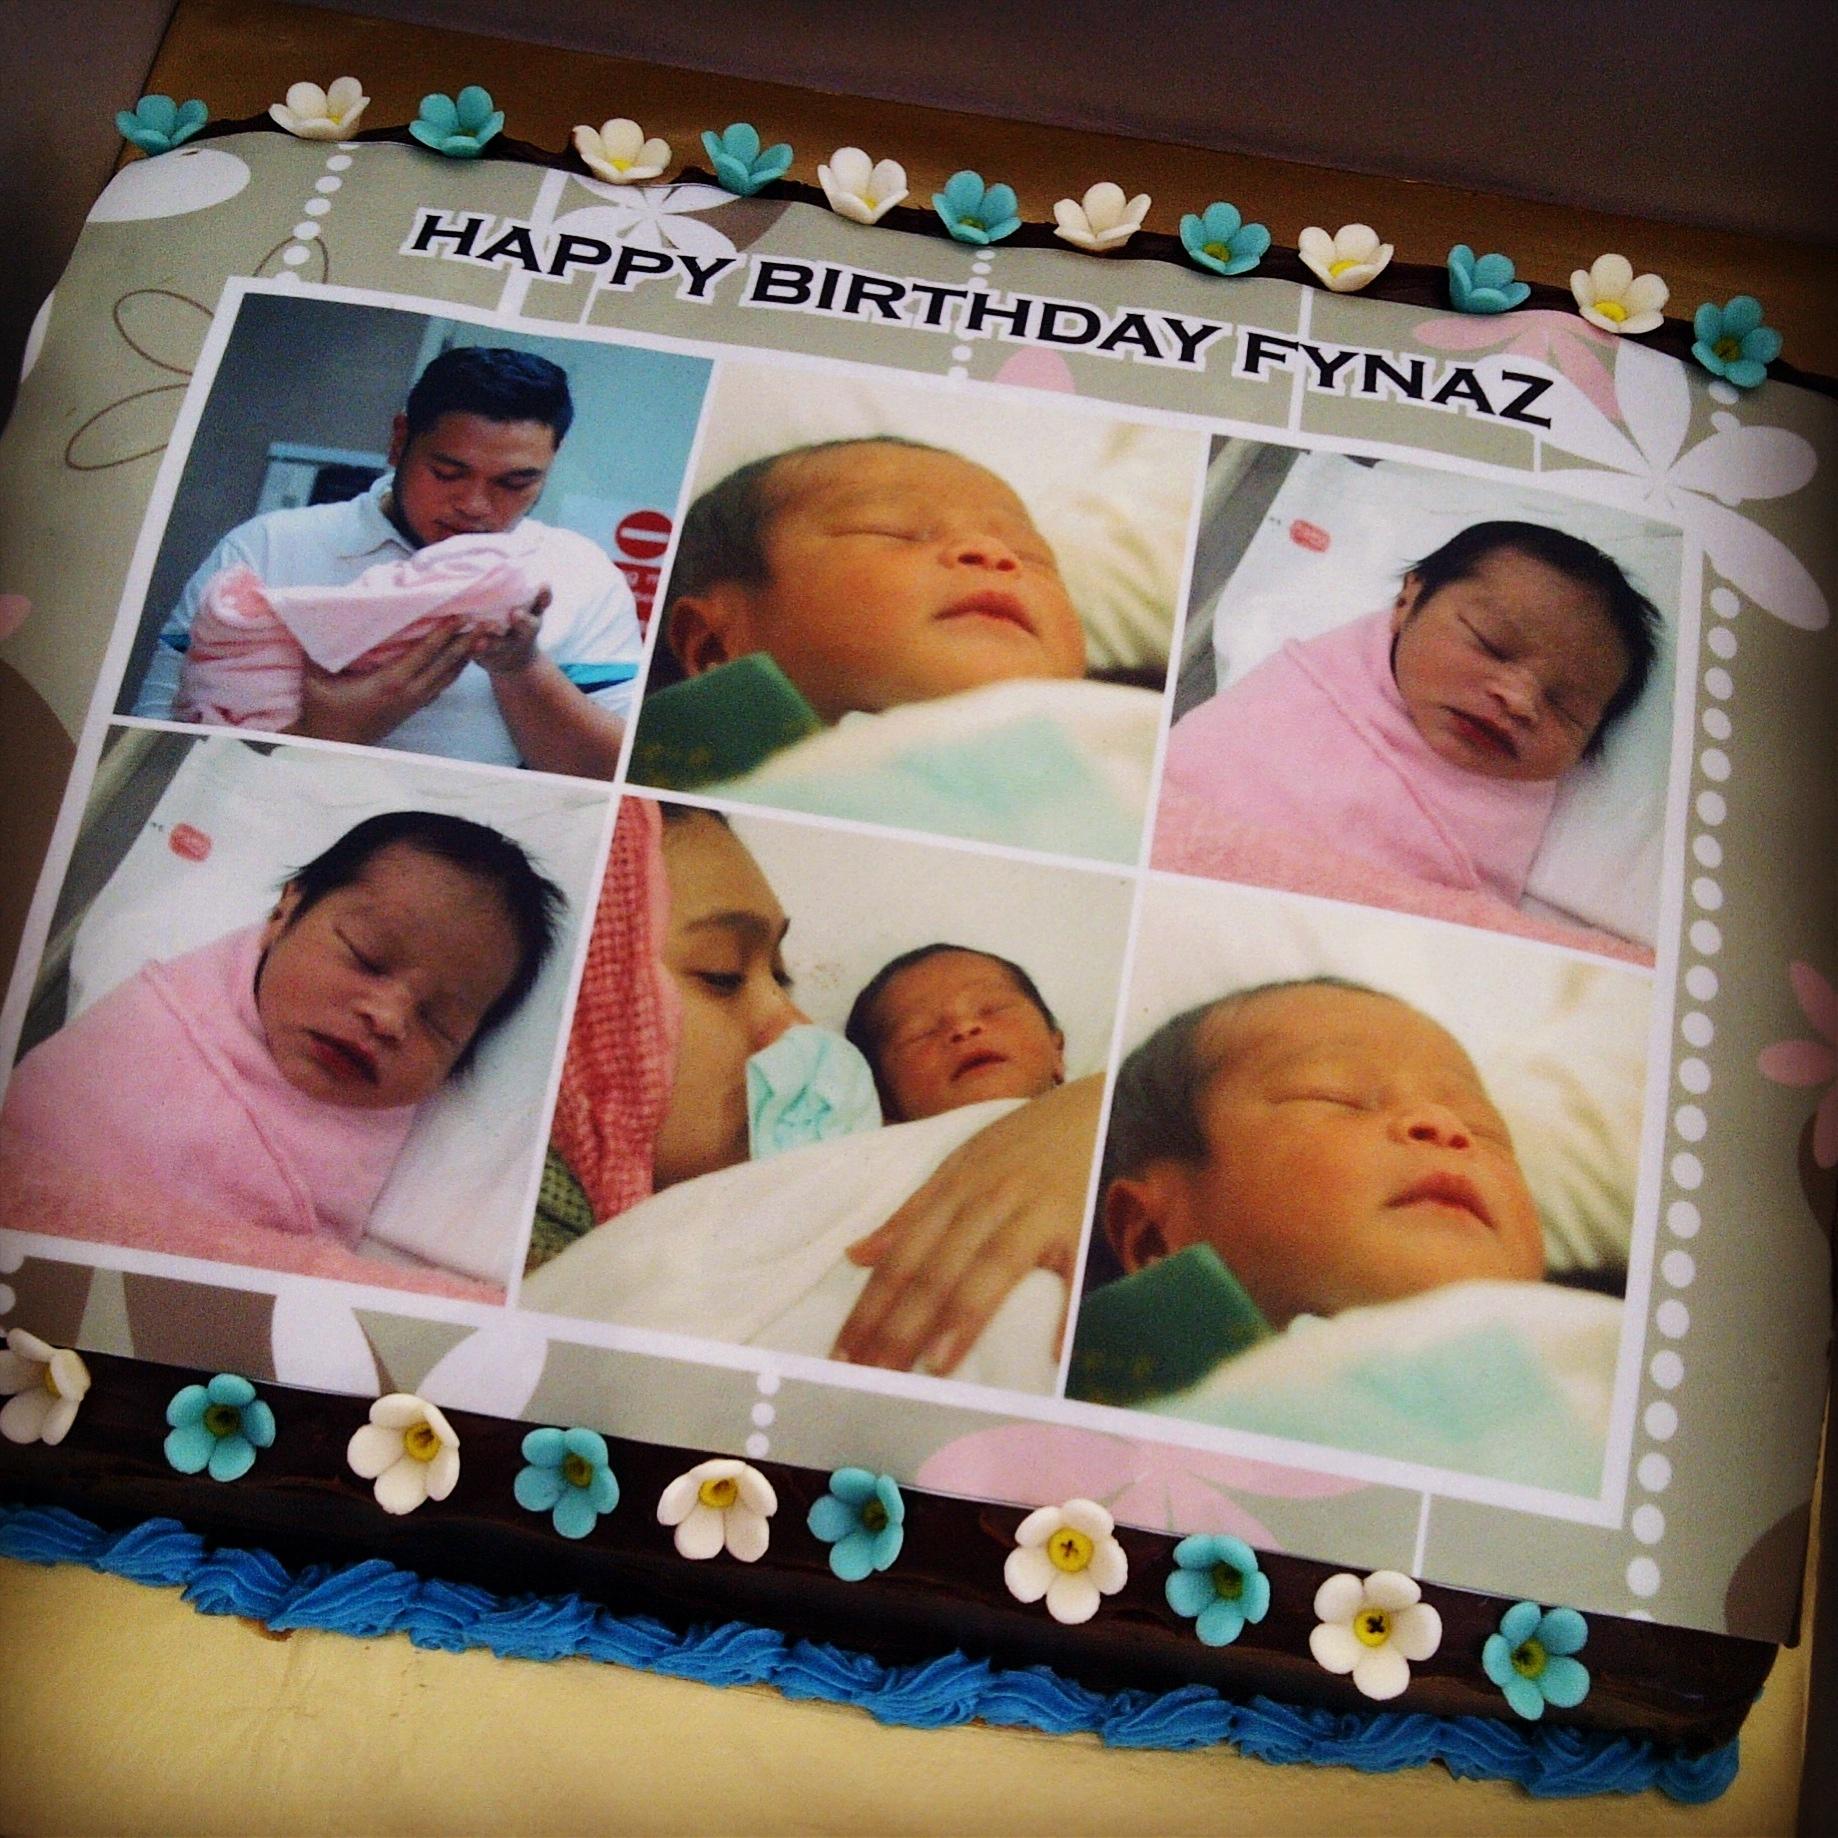 Happy Birthday Fynas